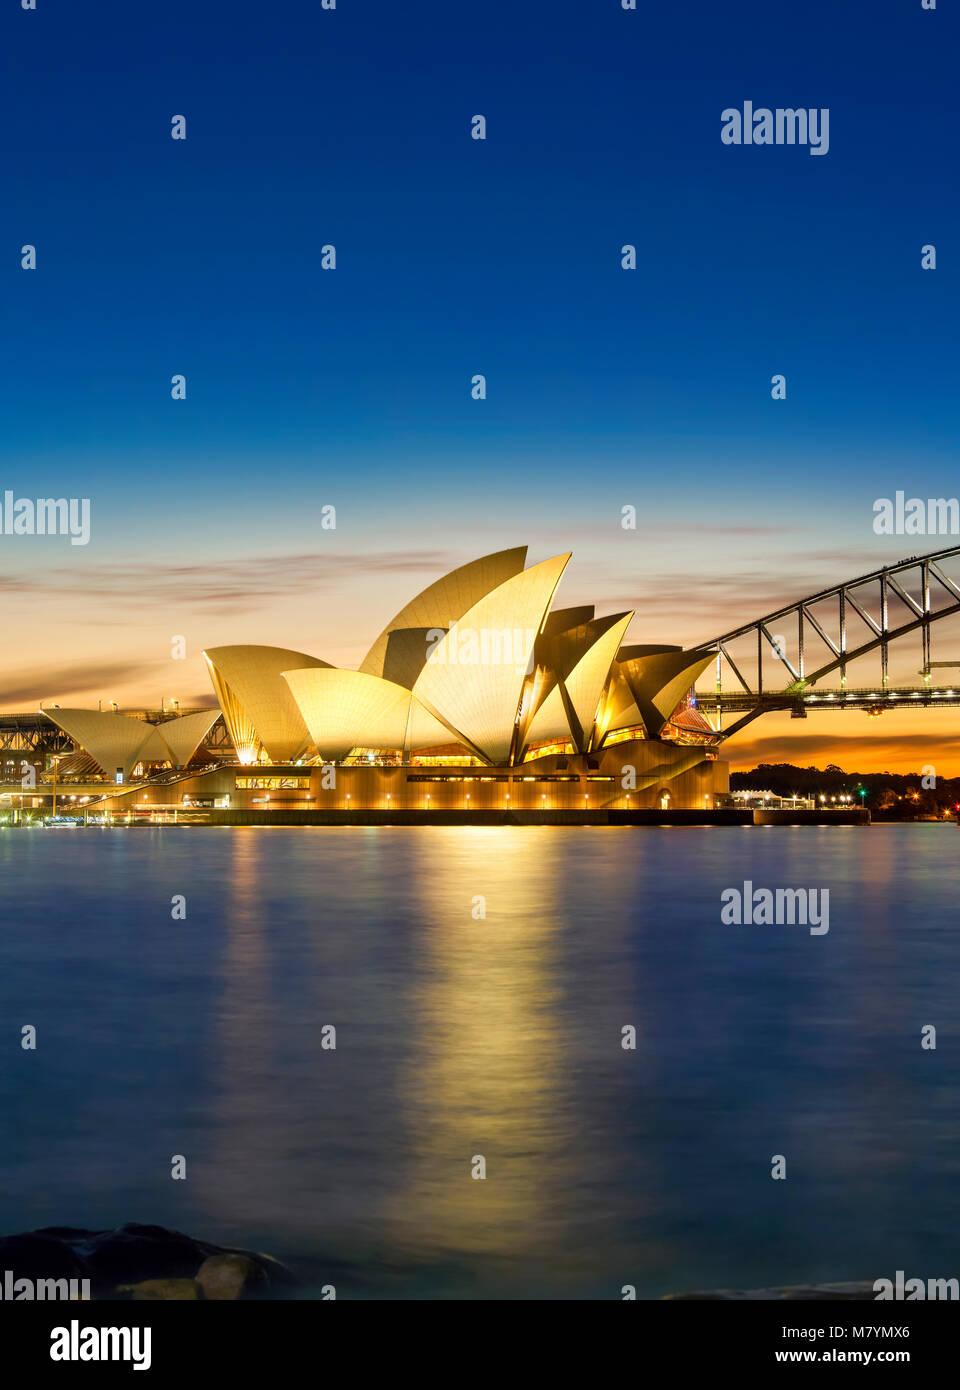 Sydney Opera House with Sydney Harbor Bridge, Sydney Harbour Bridge at sunset Sydney Australia New South Wales. Stock Photo